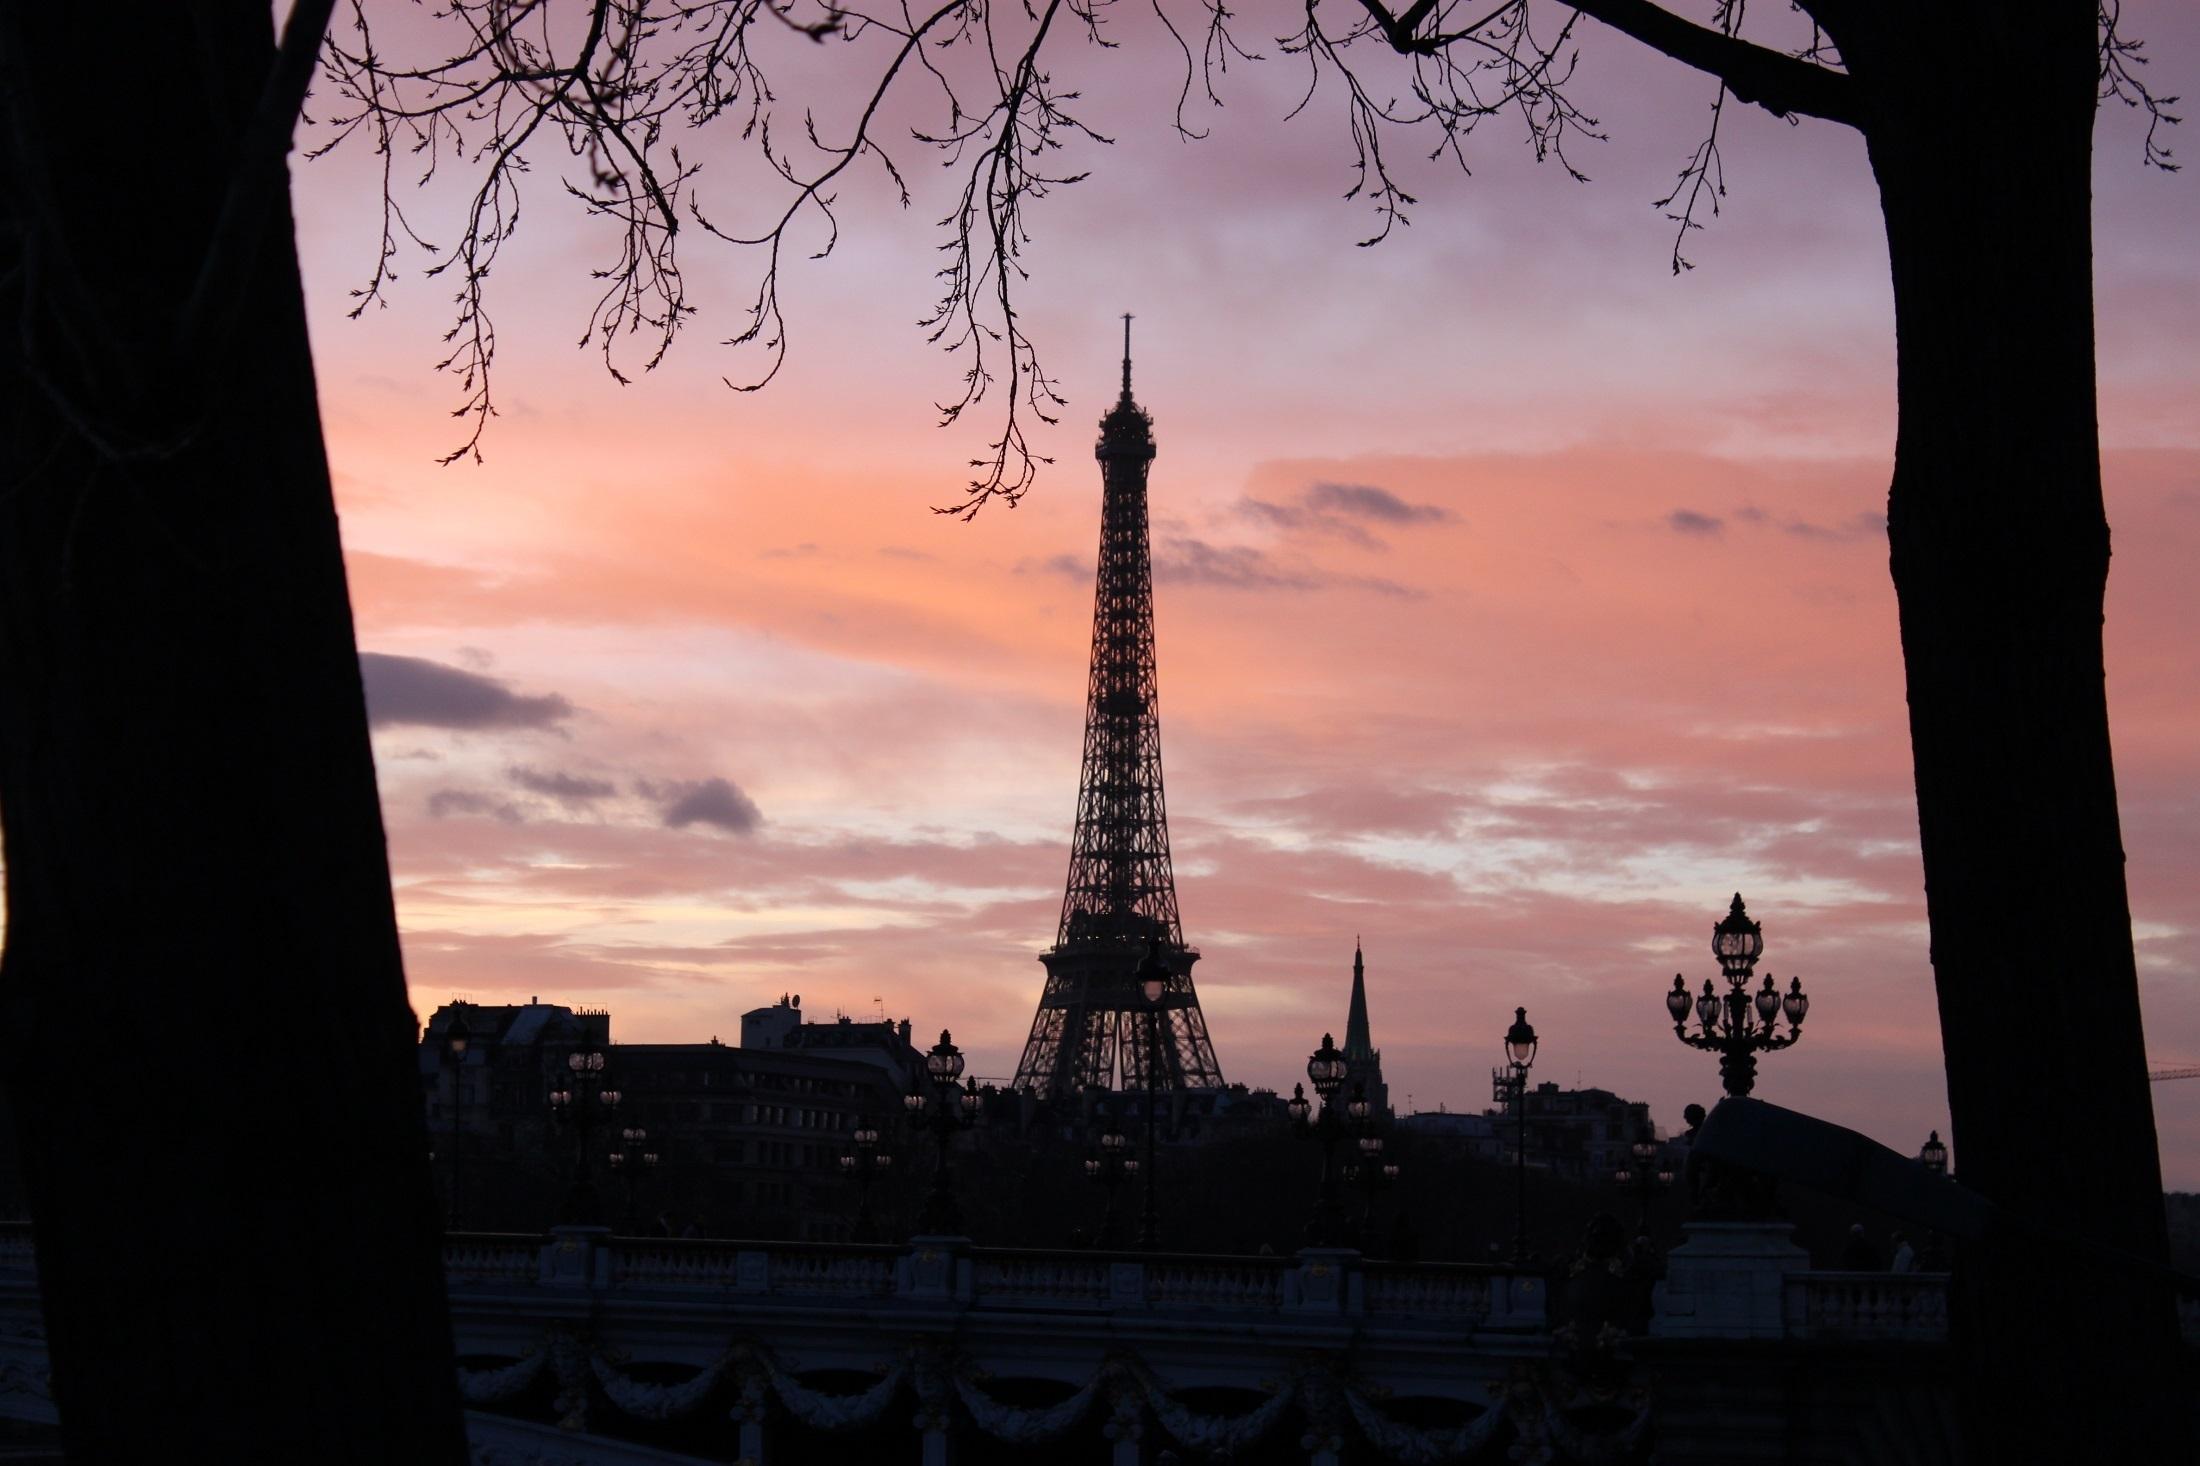 Lock Screen Wallpaper Hd Iphone 6 Eiffel Tower During Daytime 183 Free Stock Photo